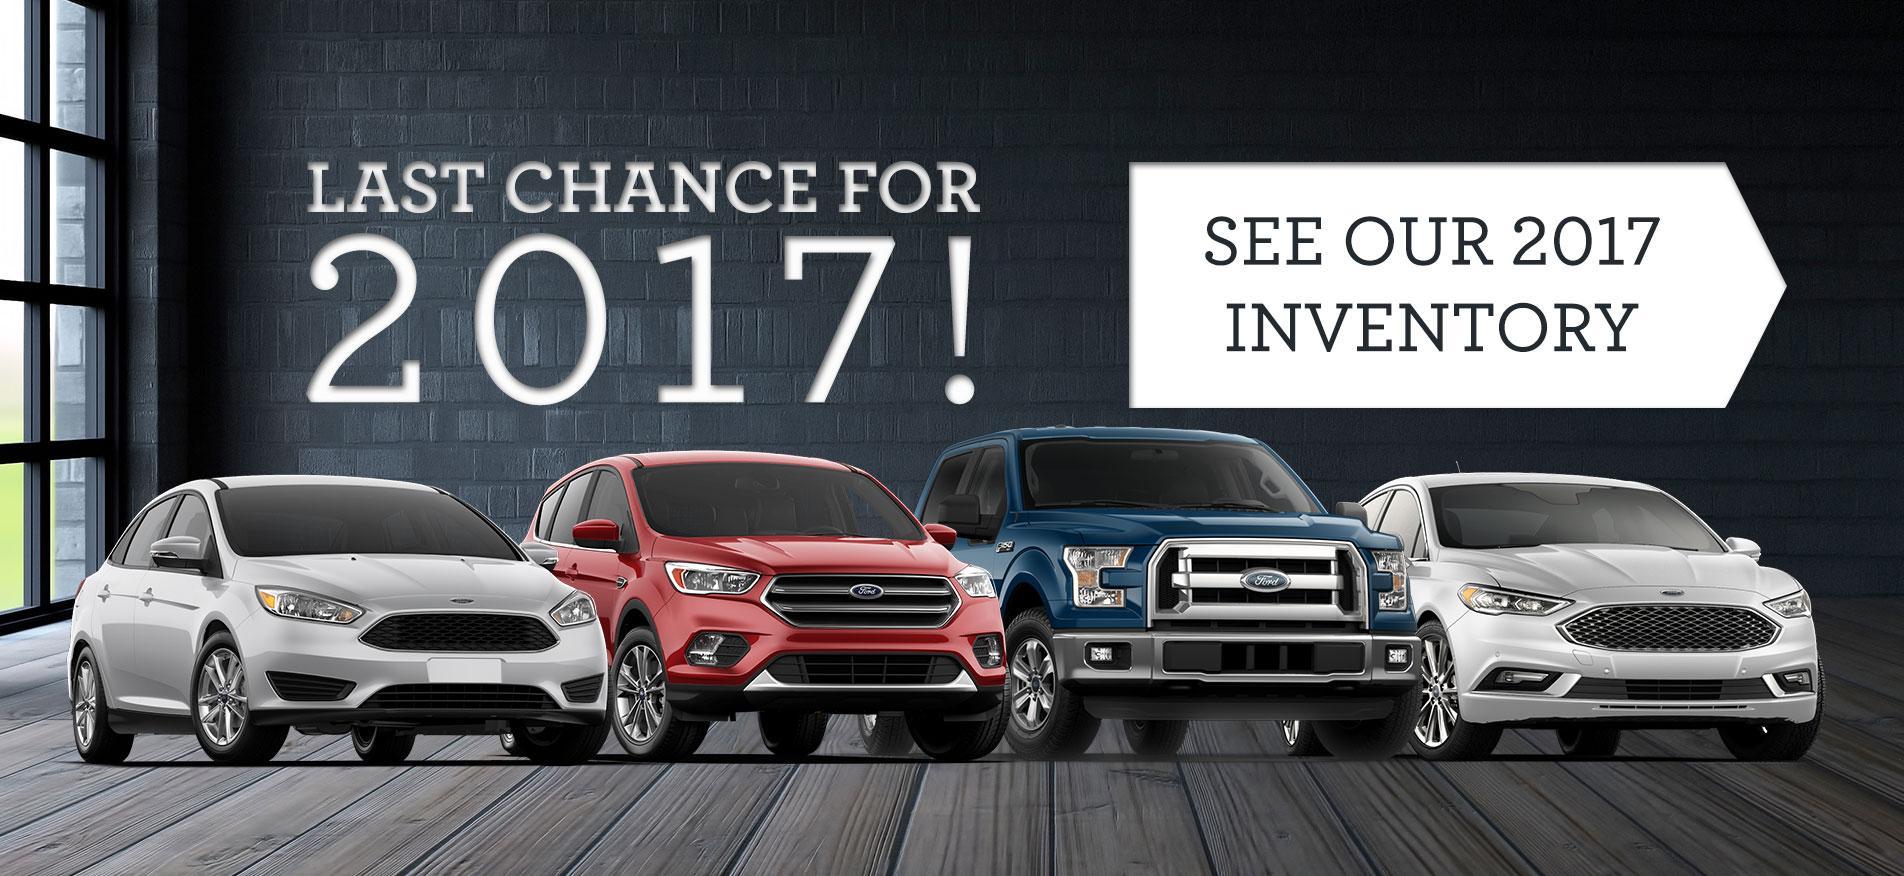 2017 inventory